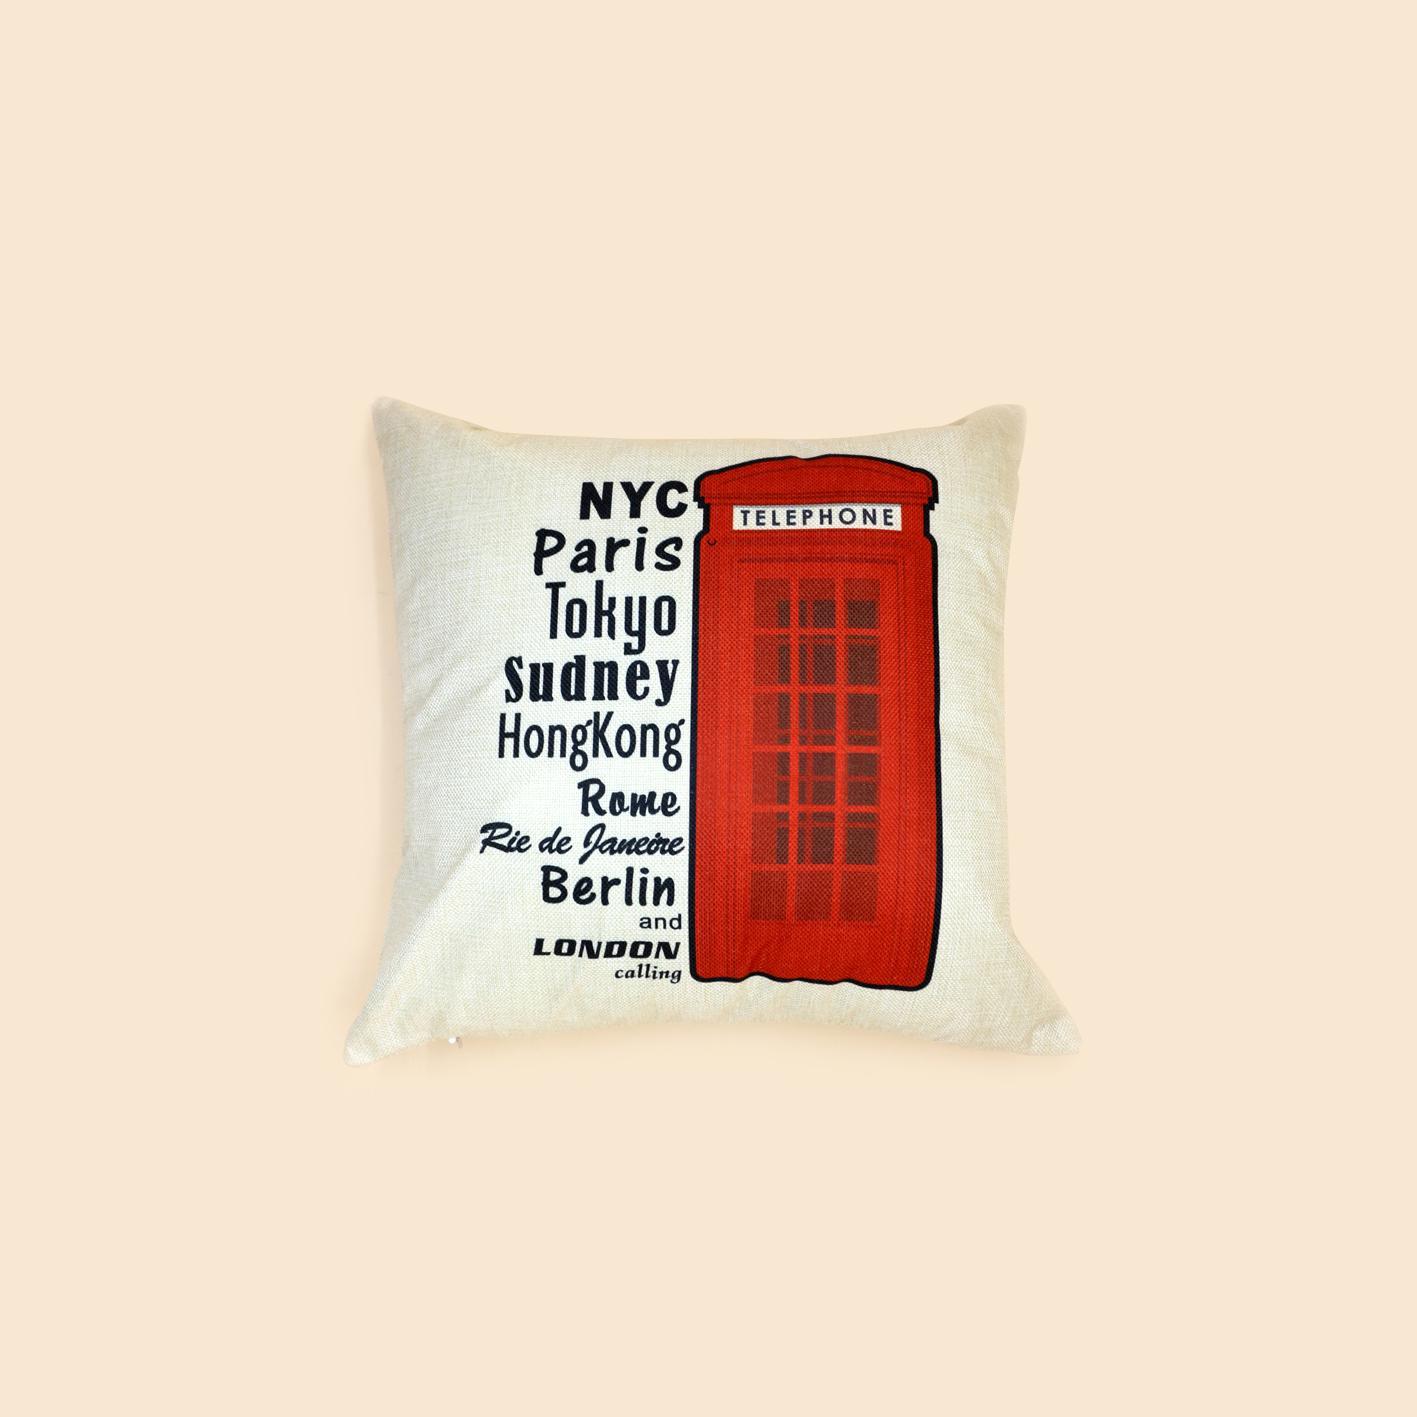 Vỏ gối tựa sofa London 45*45 - London Items Pillow Case S20